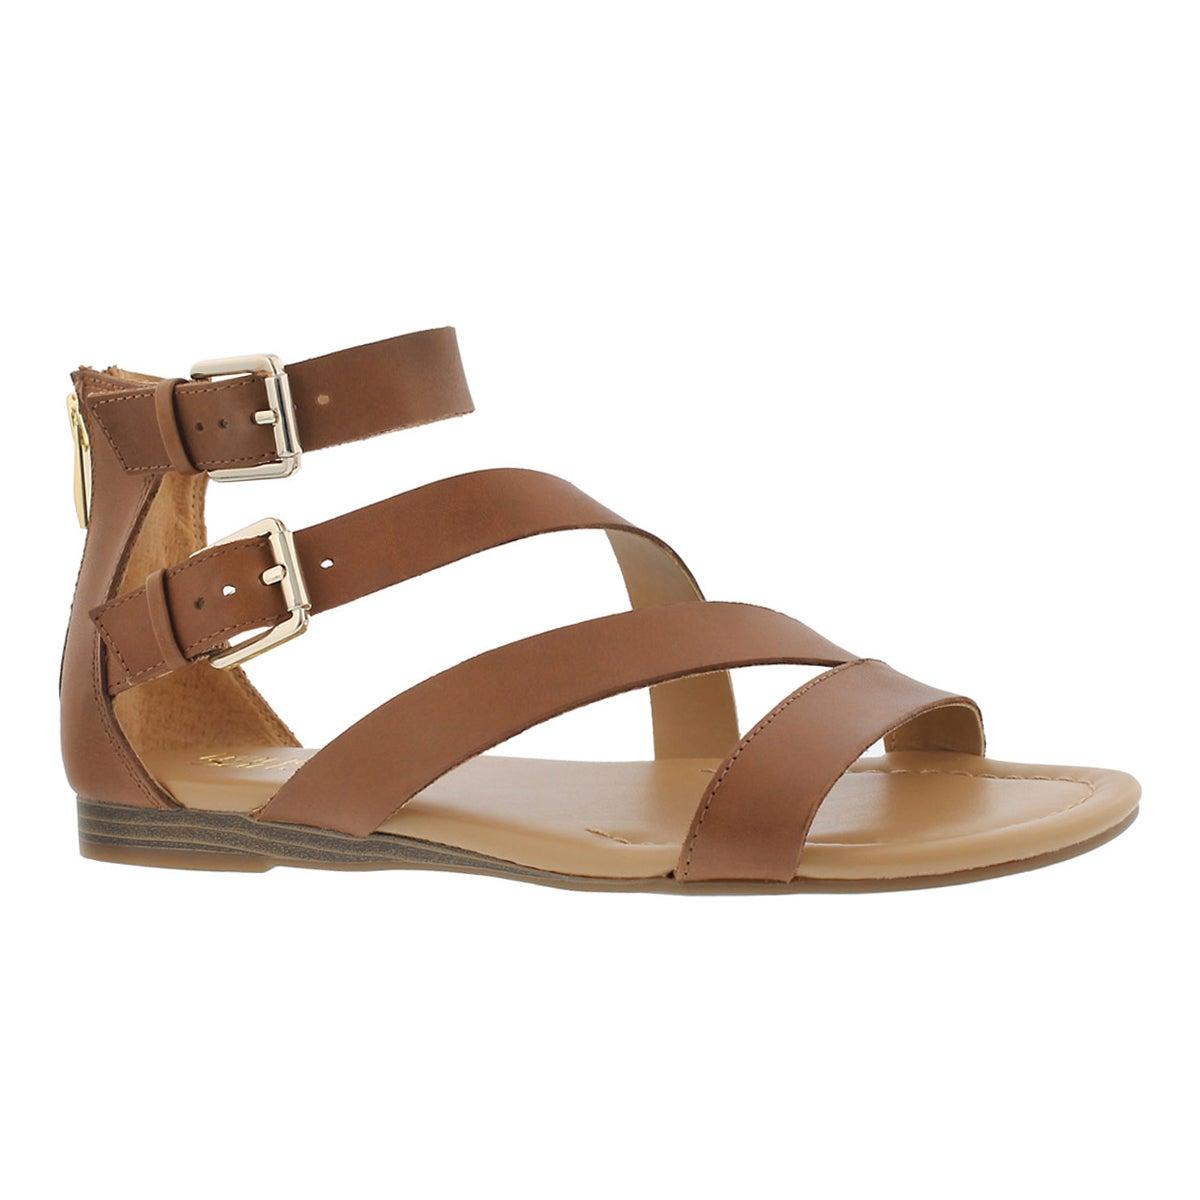 Women's GRETA saddle tan casual wedge sandals